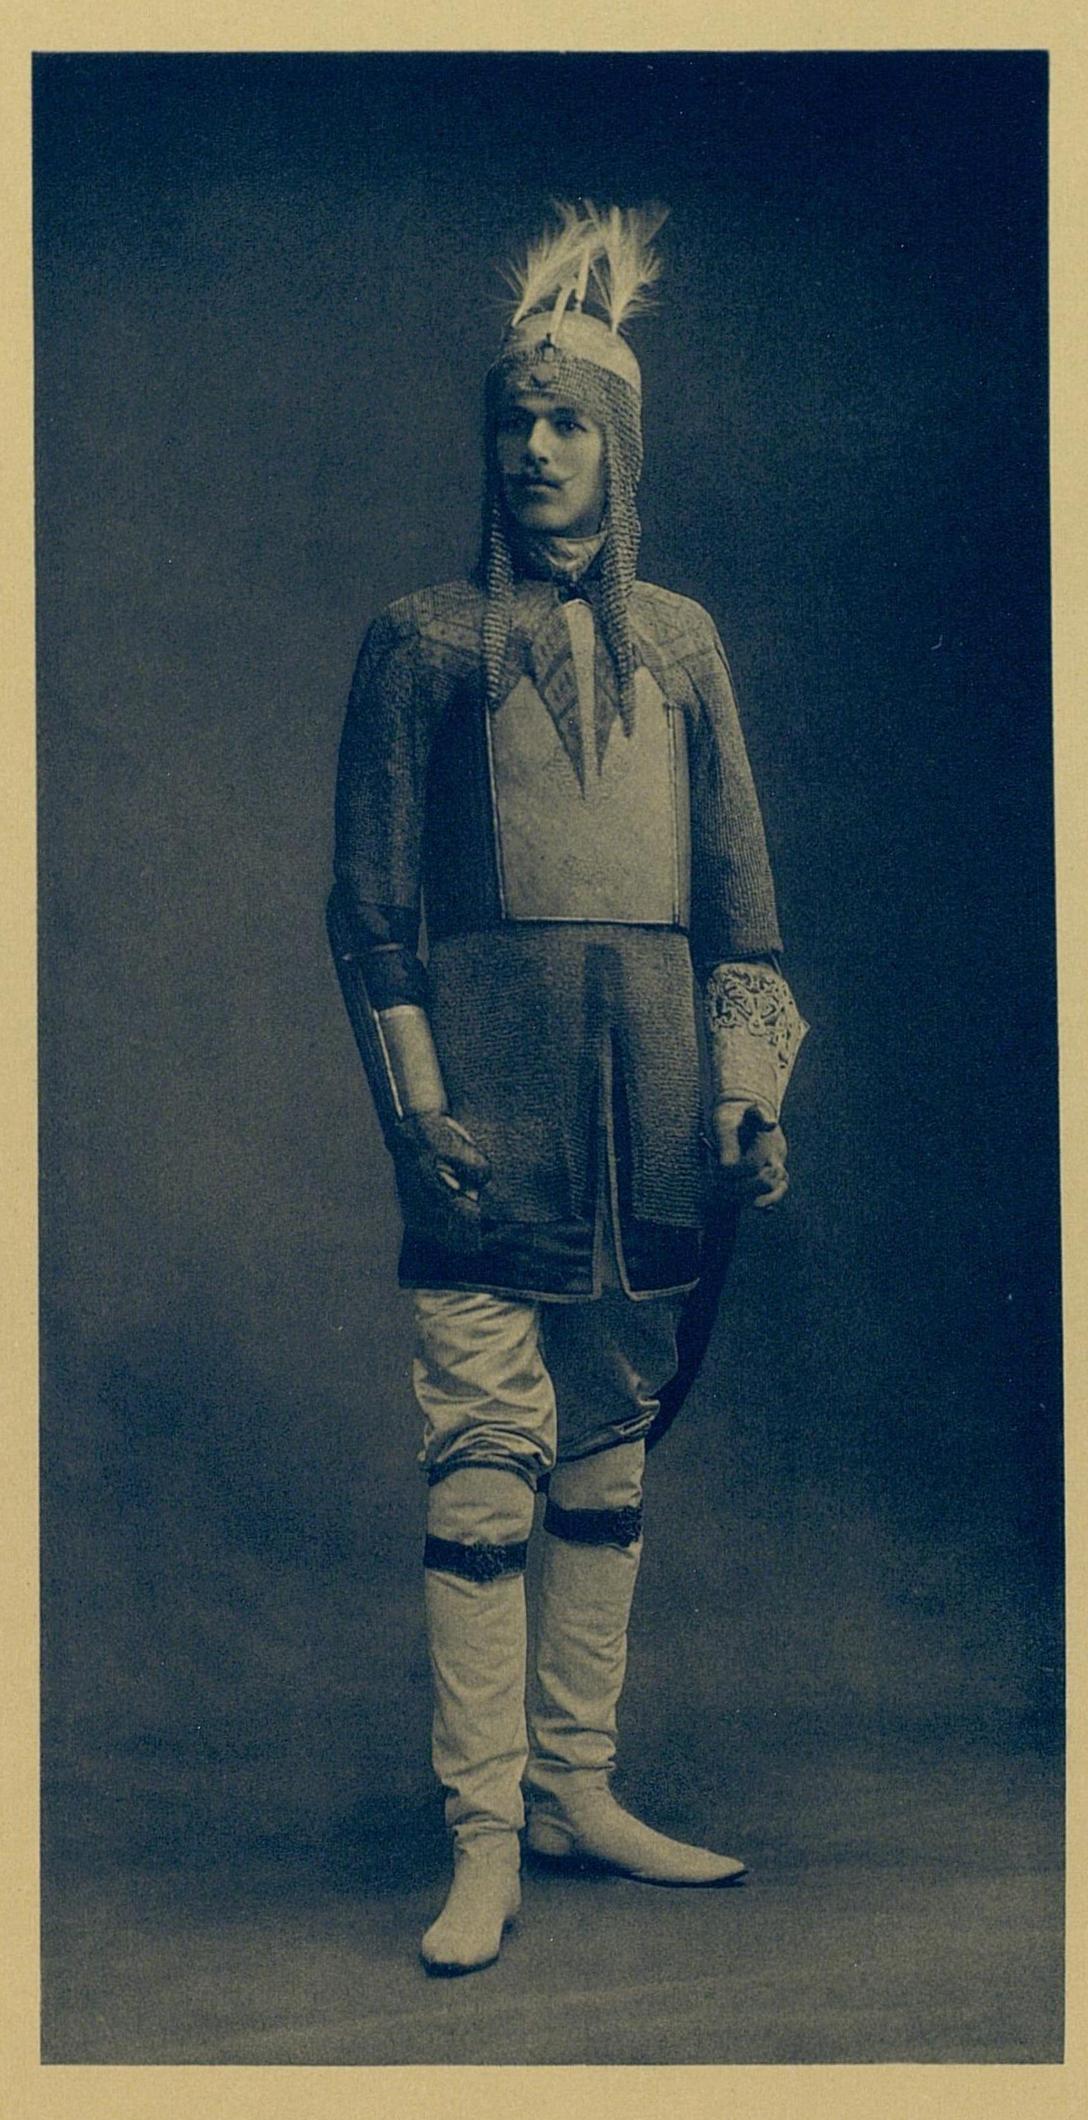 http://upload.wikimedia.org/wikipedia/commons/4/44/1903_ball_-_Vas._Vas._Soldatenkov.jpeg